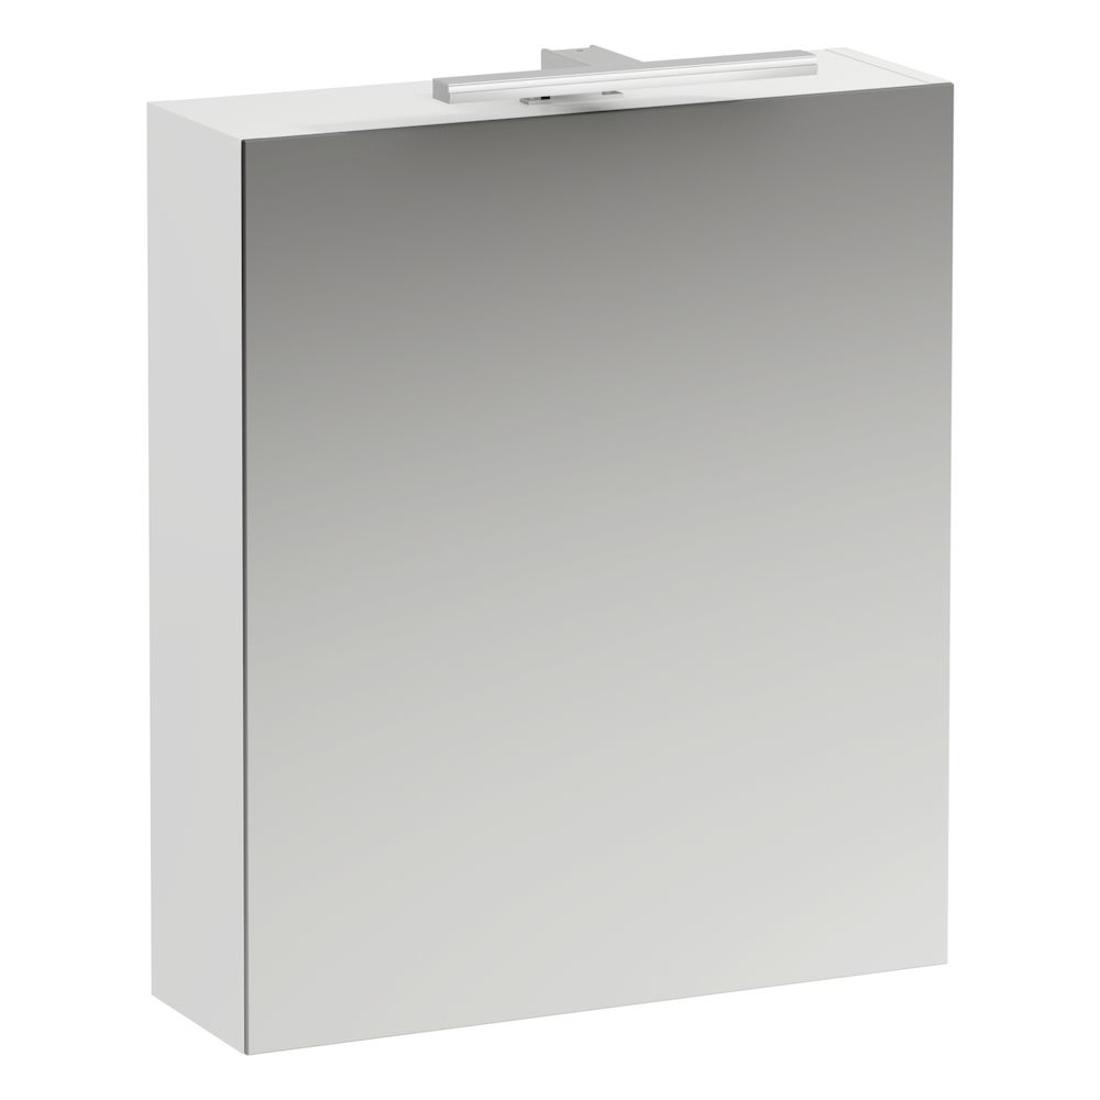 Picture of BASE ormarić sa ogledalom i LED rasvetom 60x70cm levi